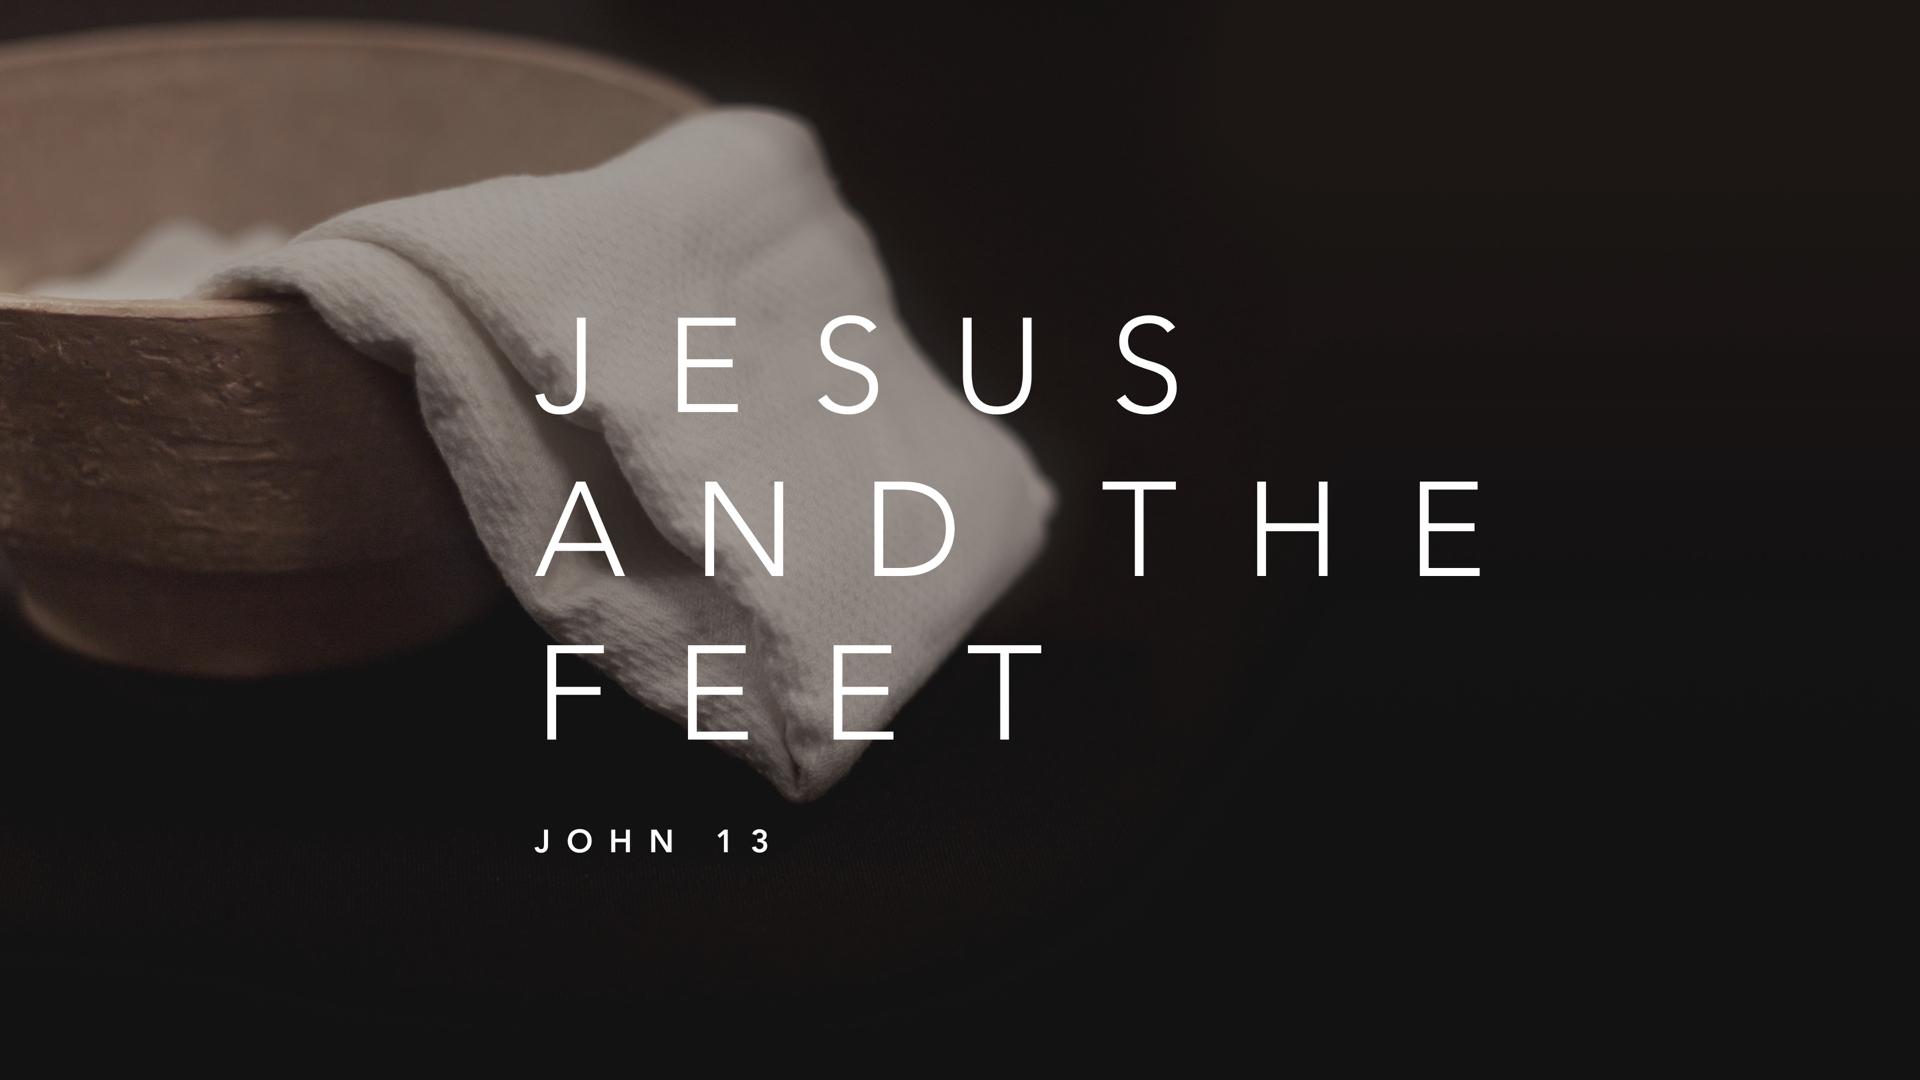 shocking jesus 13 - jesus and the feet.001.jpeg